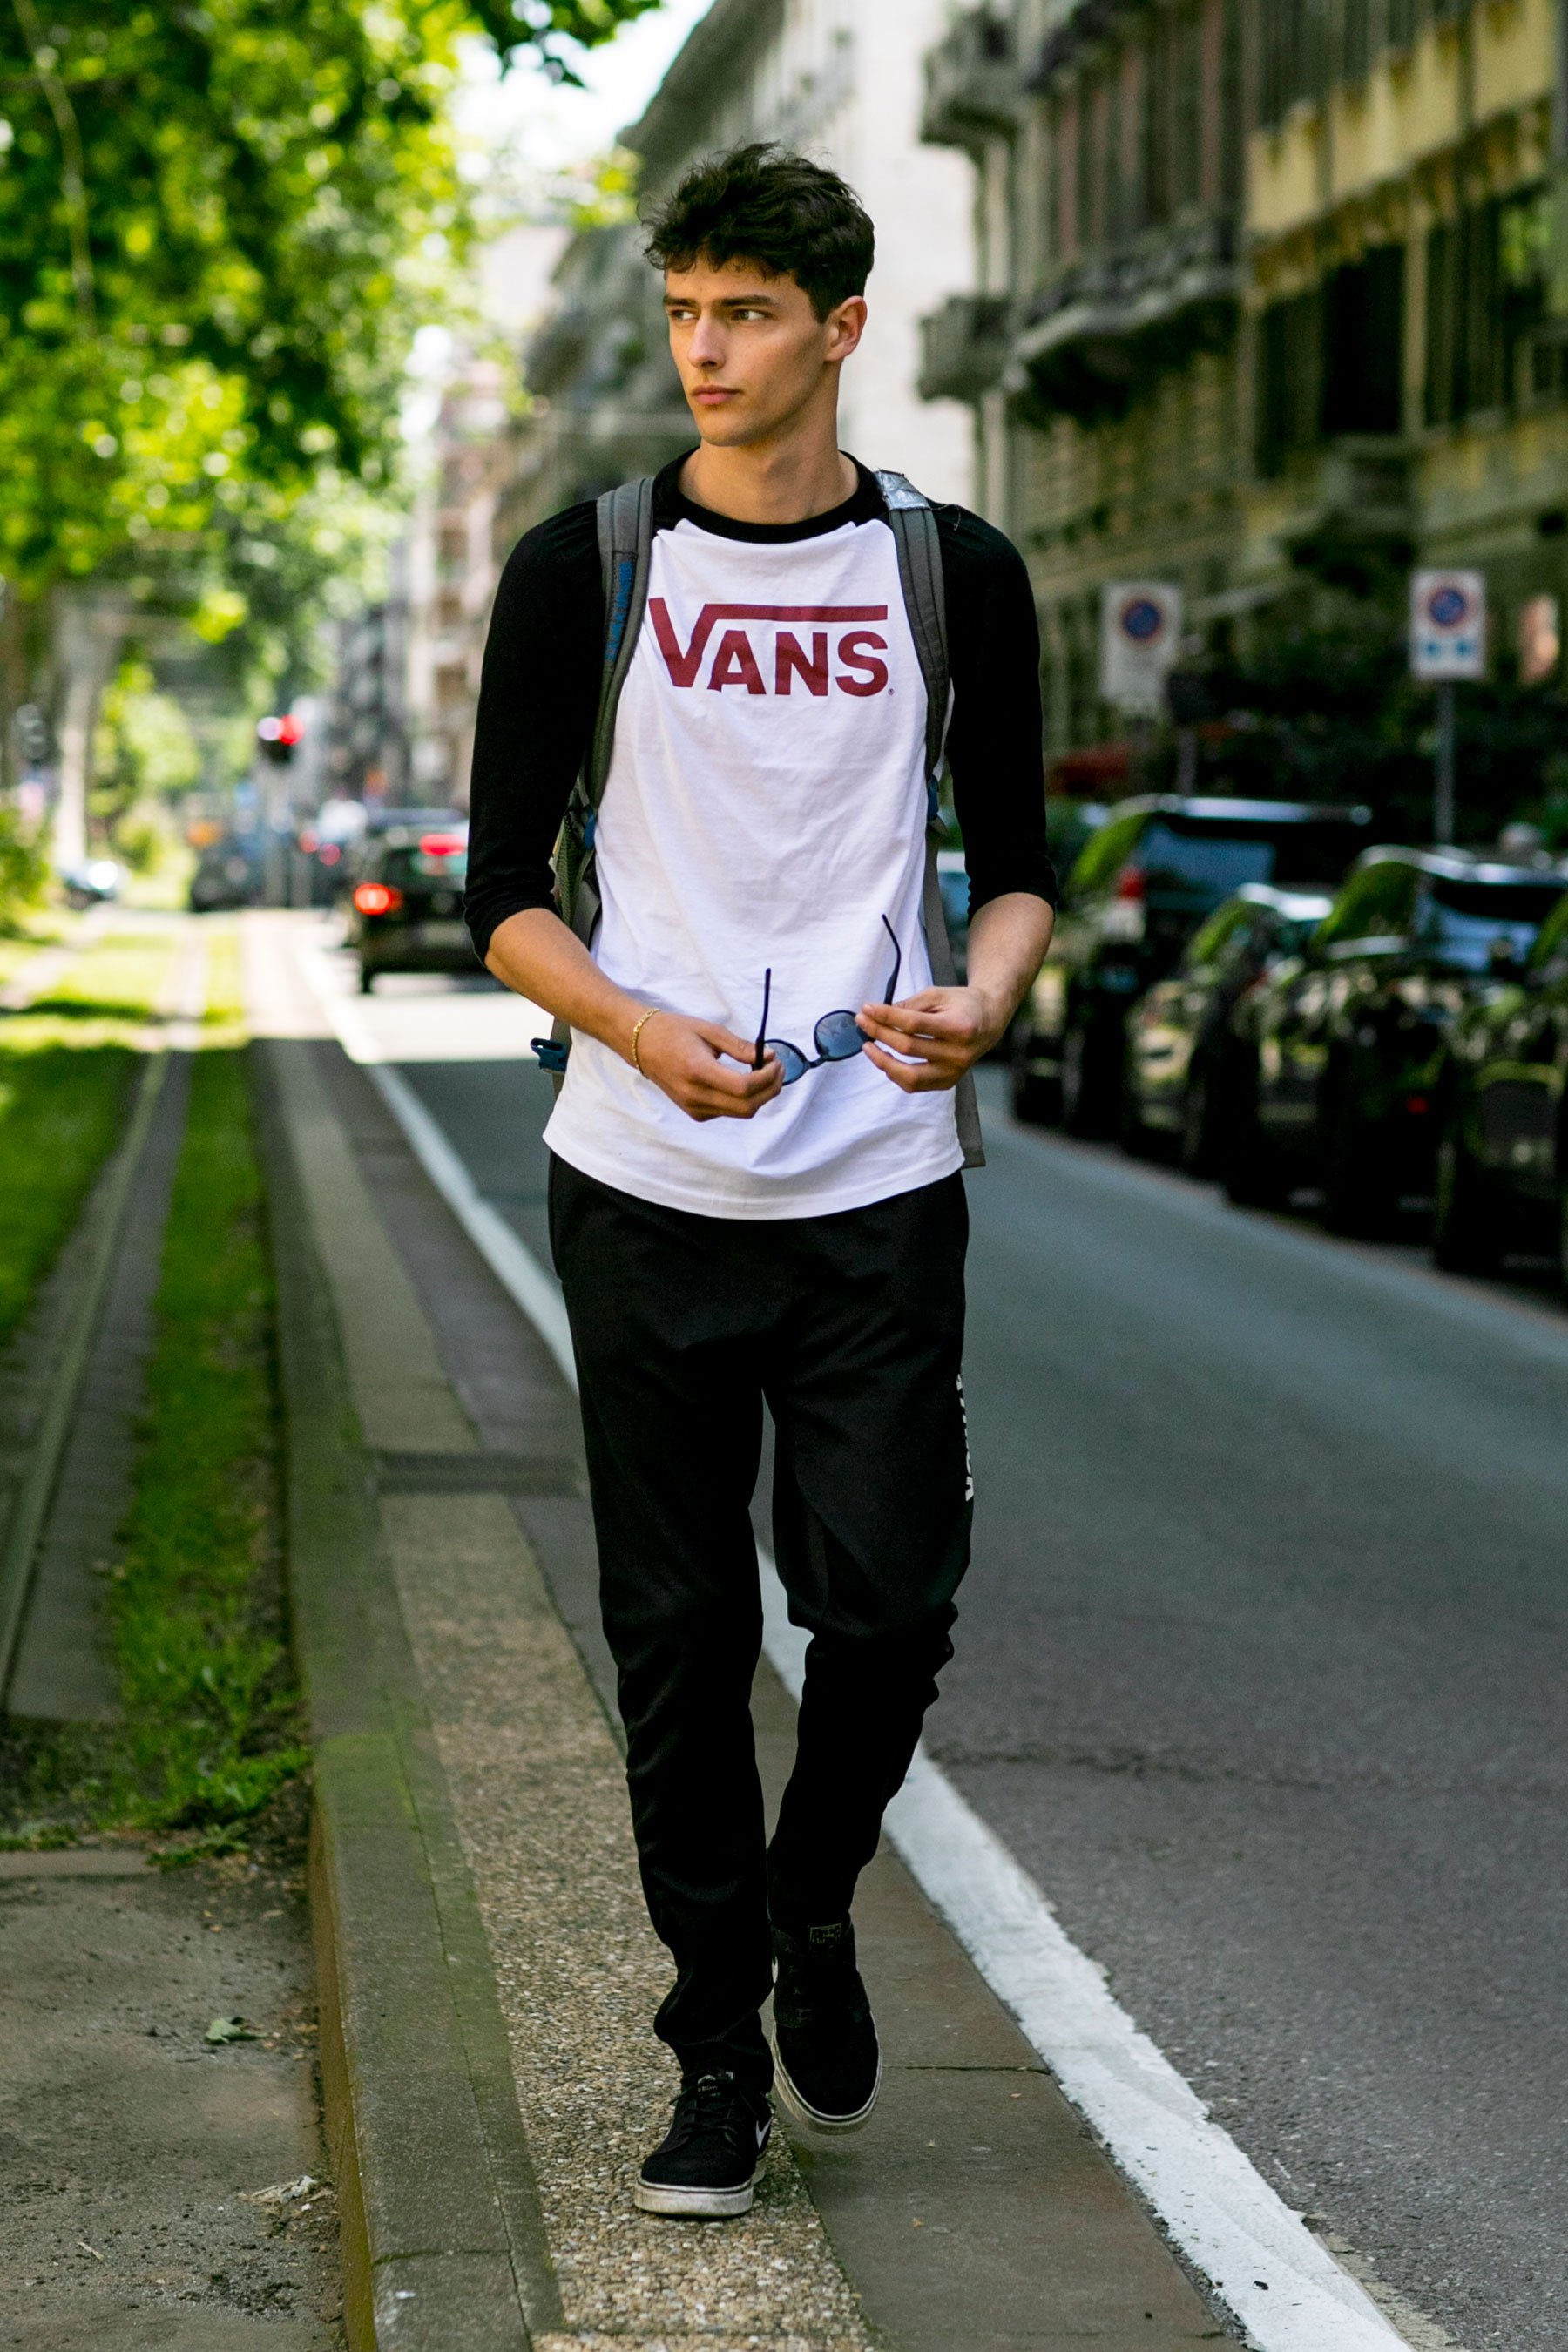 VANSラグランロングTシャツ×黒パンツ×Nike SB ズーム ステファンジャノスキー黒